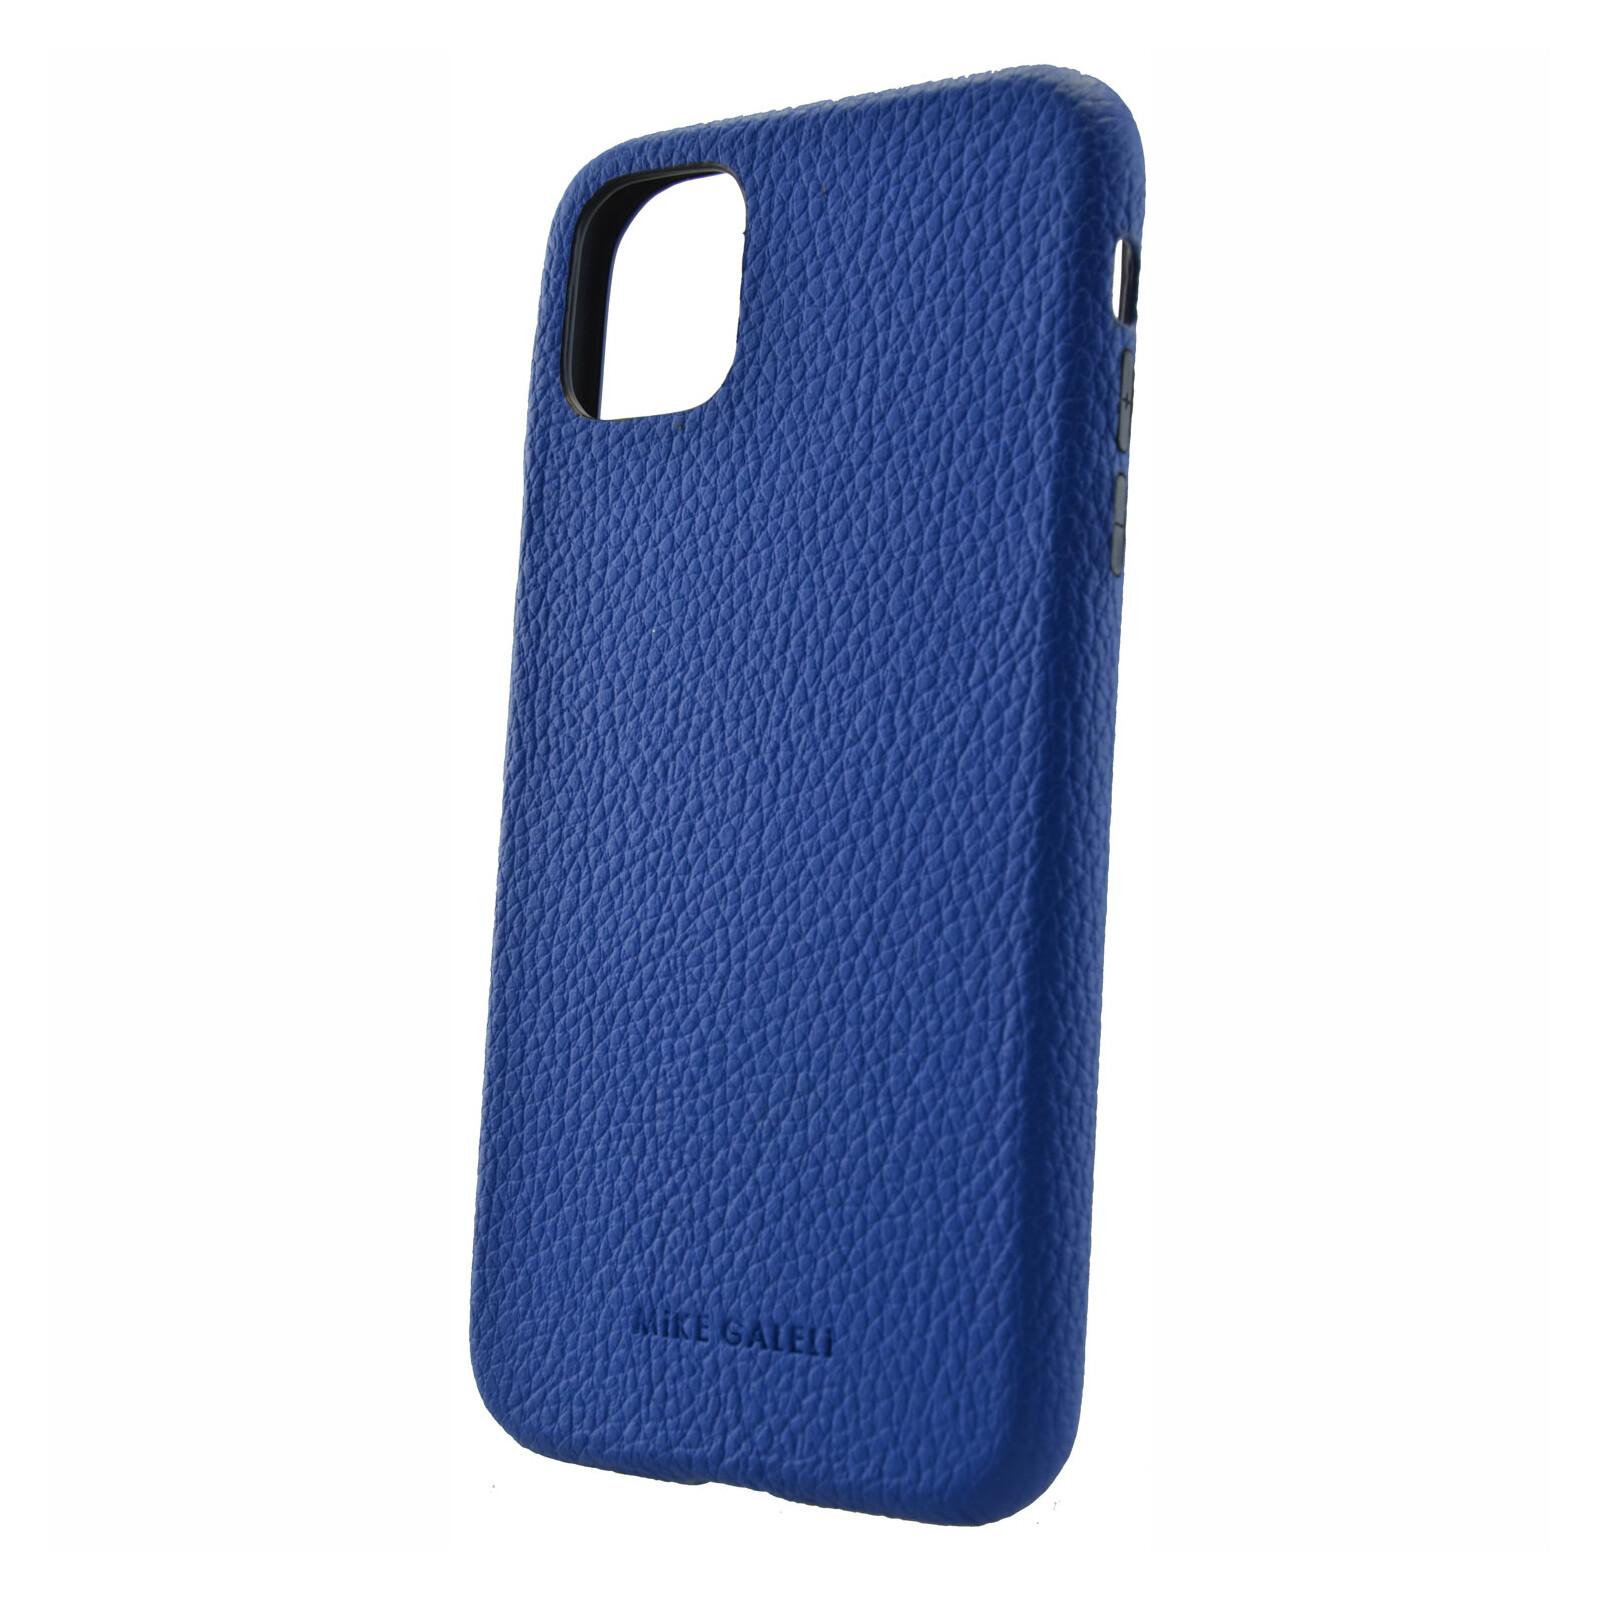 Galeli Backcover FINN Apple iPhone 12 mini true blue